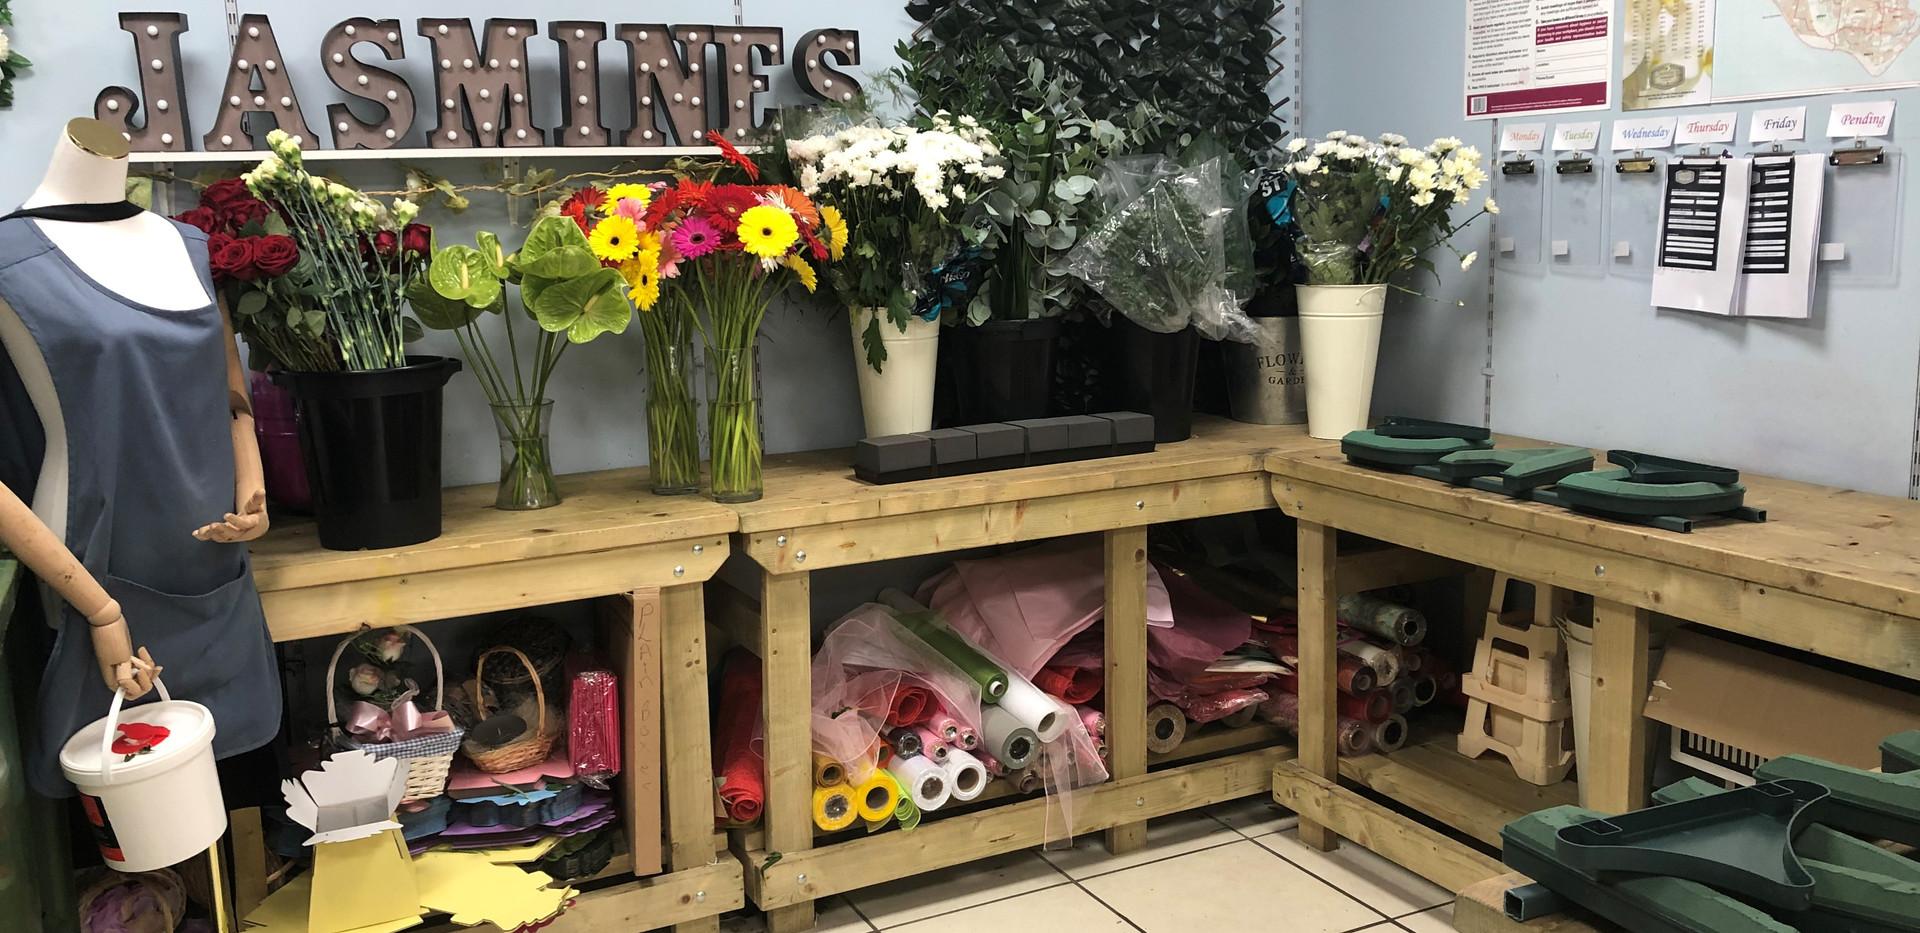 Jasmines Flower Shop 3.jpg